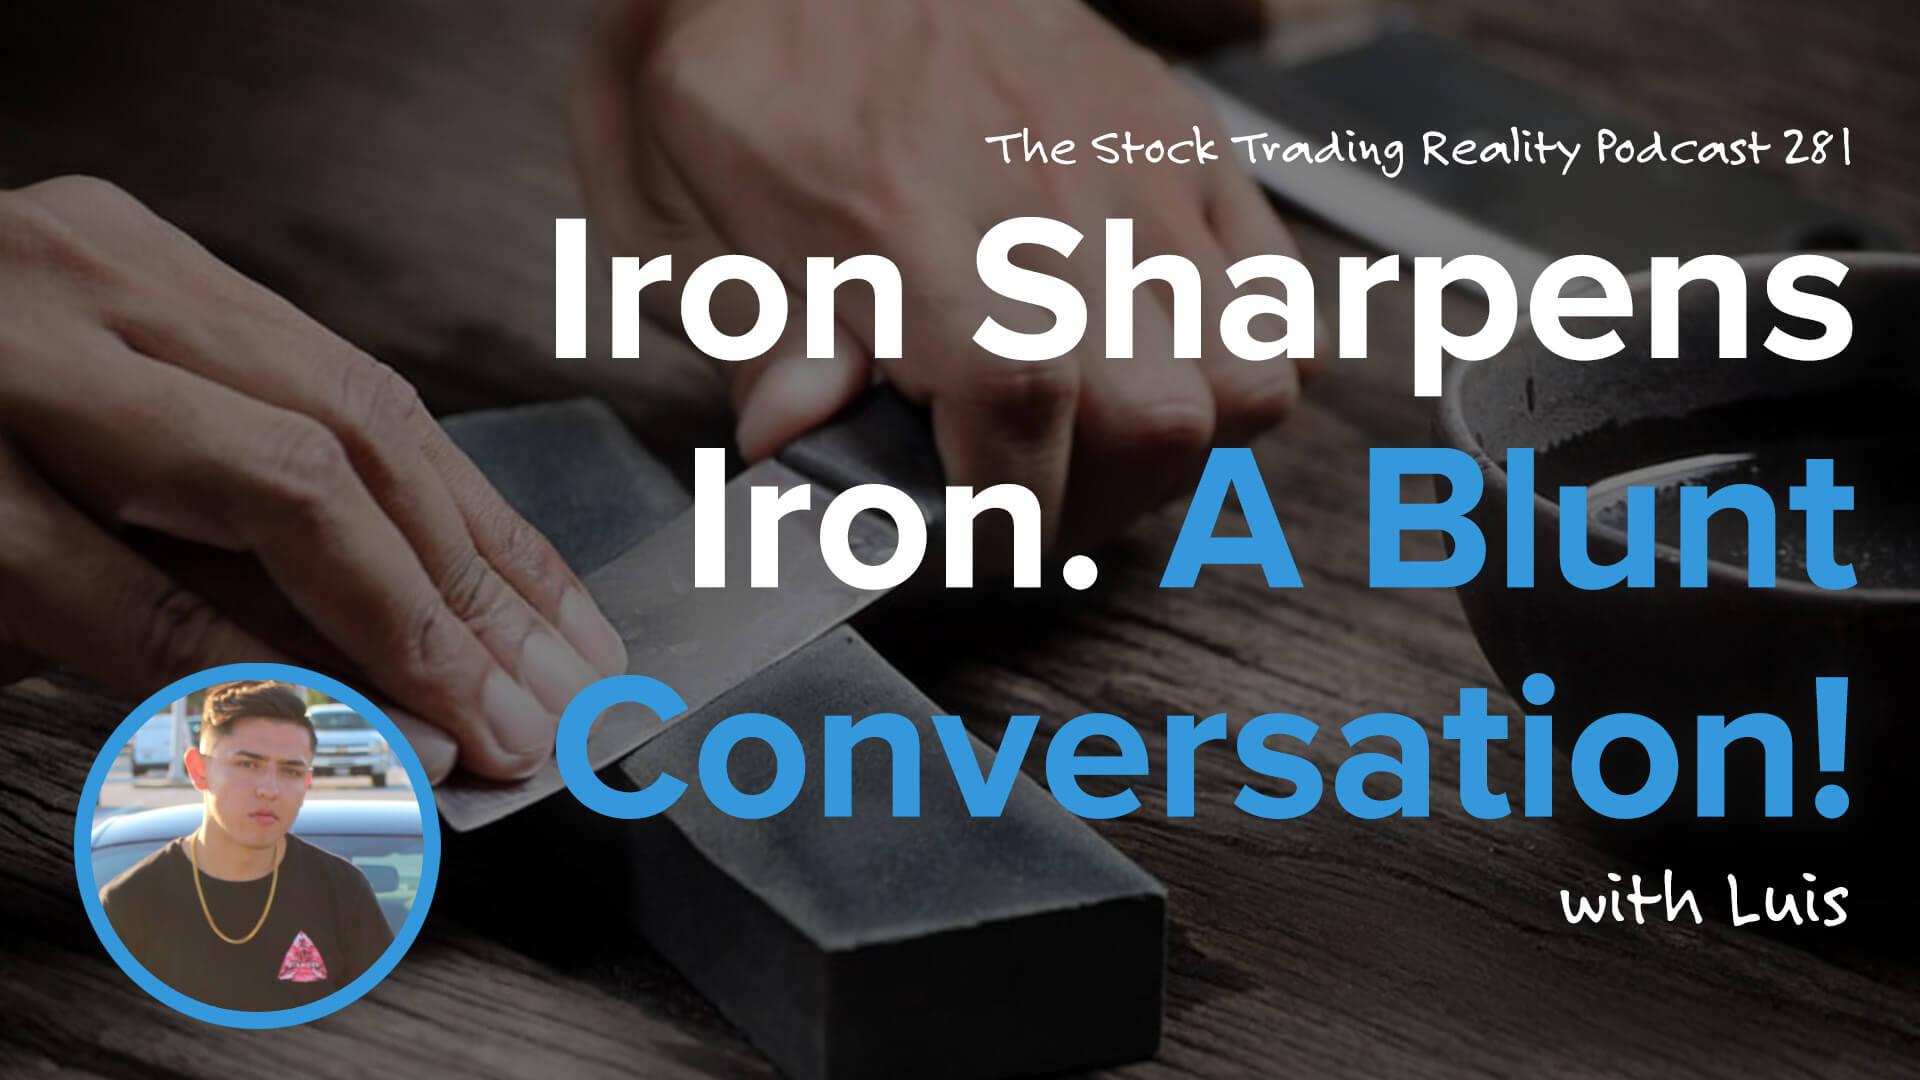 Iron Sharpens Iron. A Blunt Conversation!   STR 281